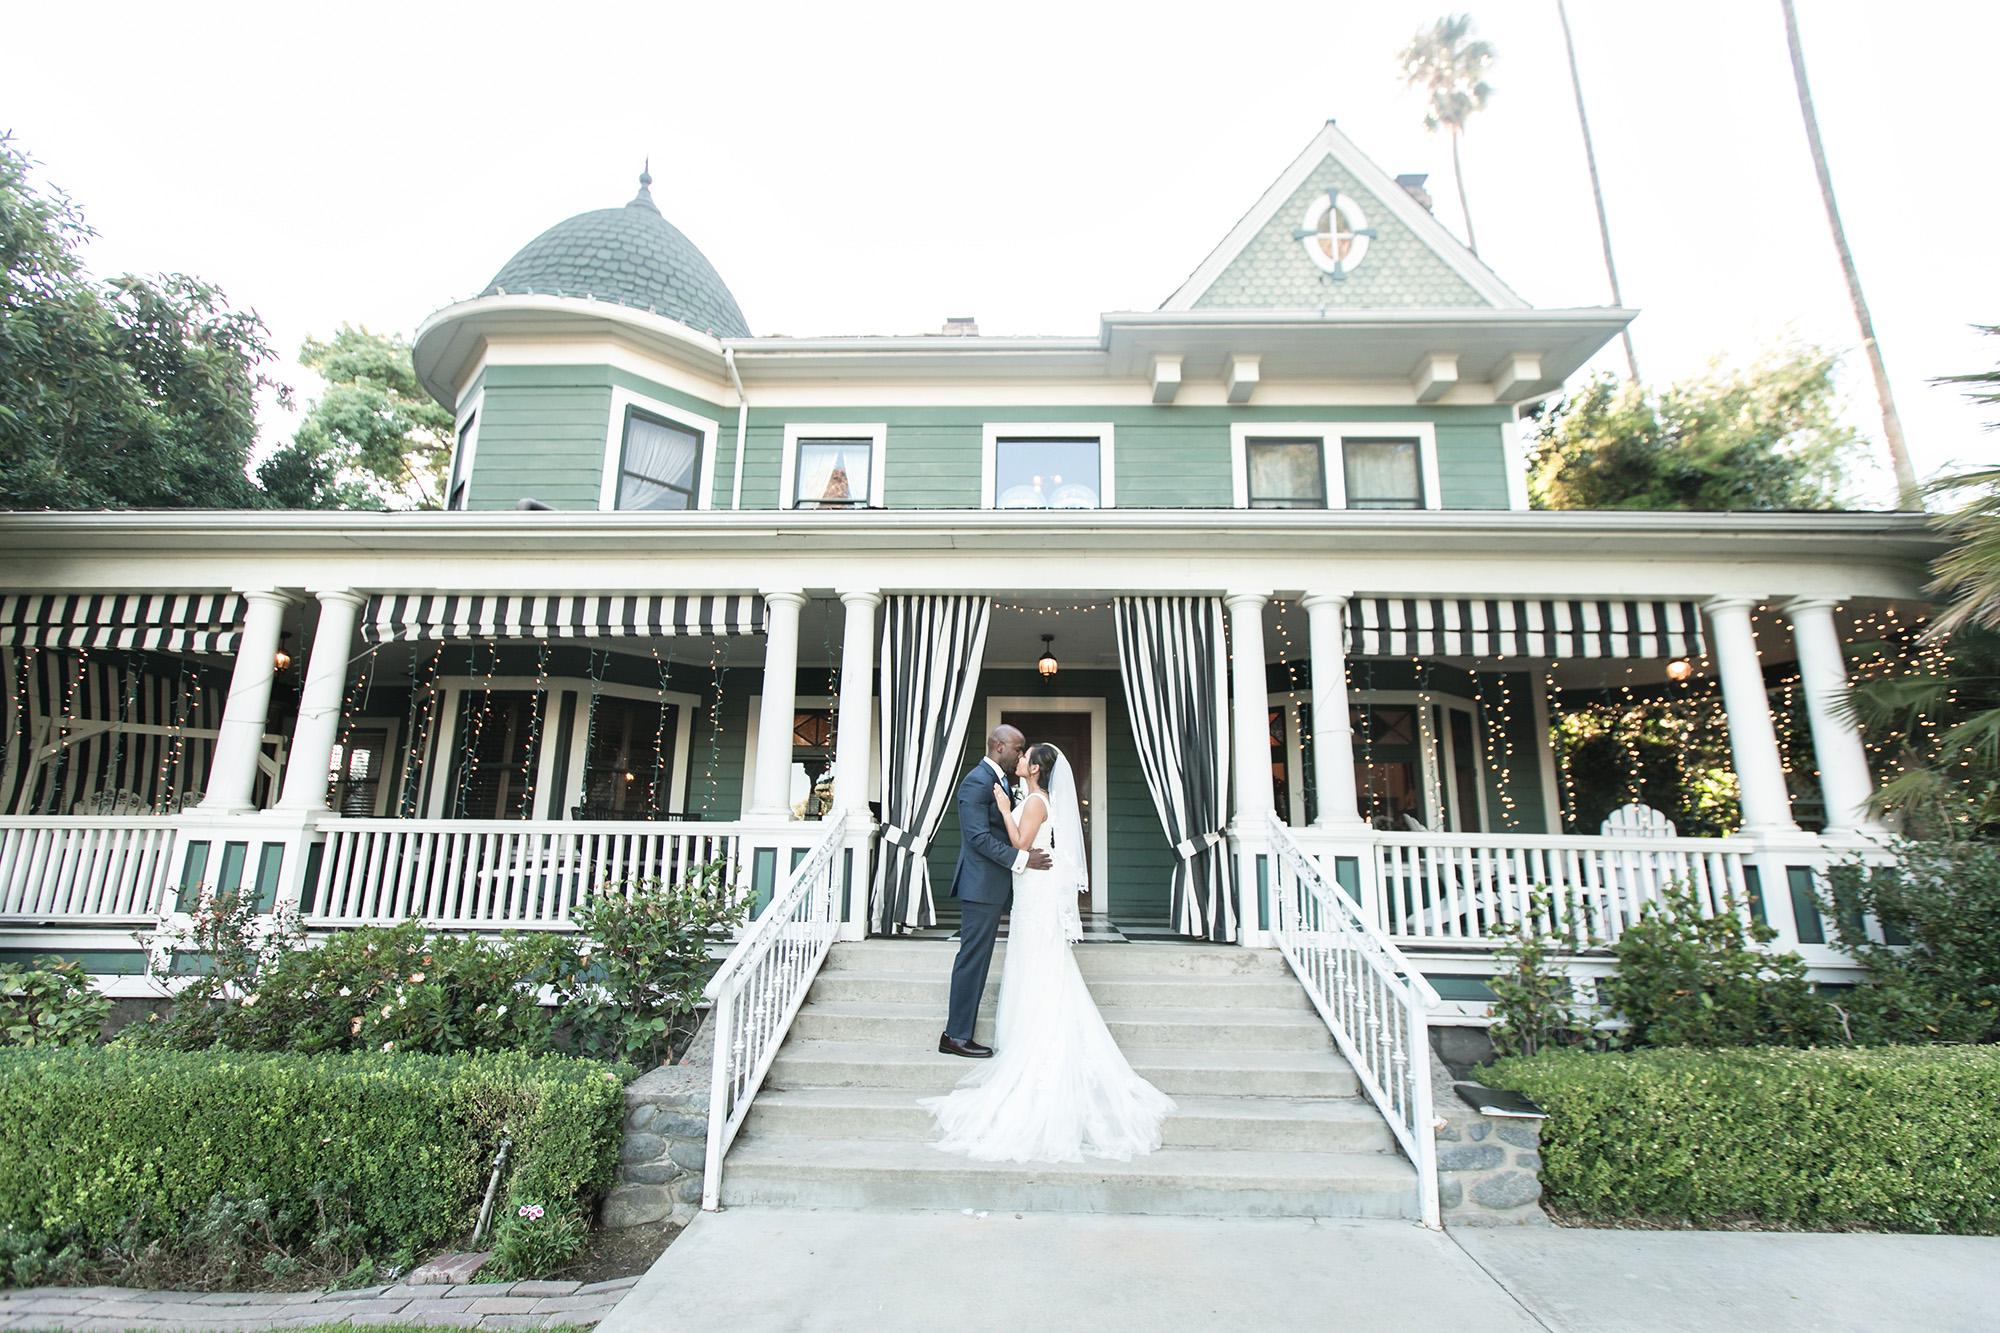 christmas-house-weddings-receptions-carrie-vines-175.jpg